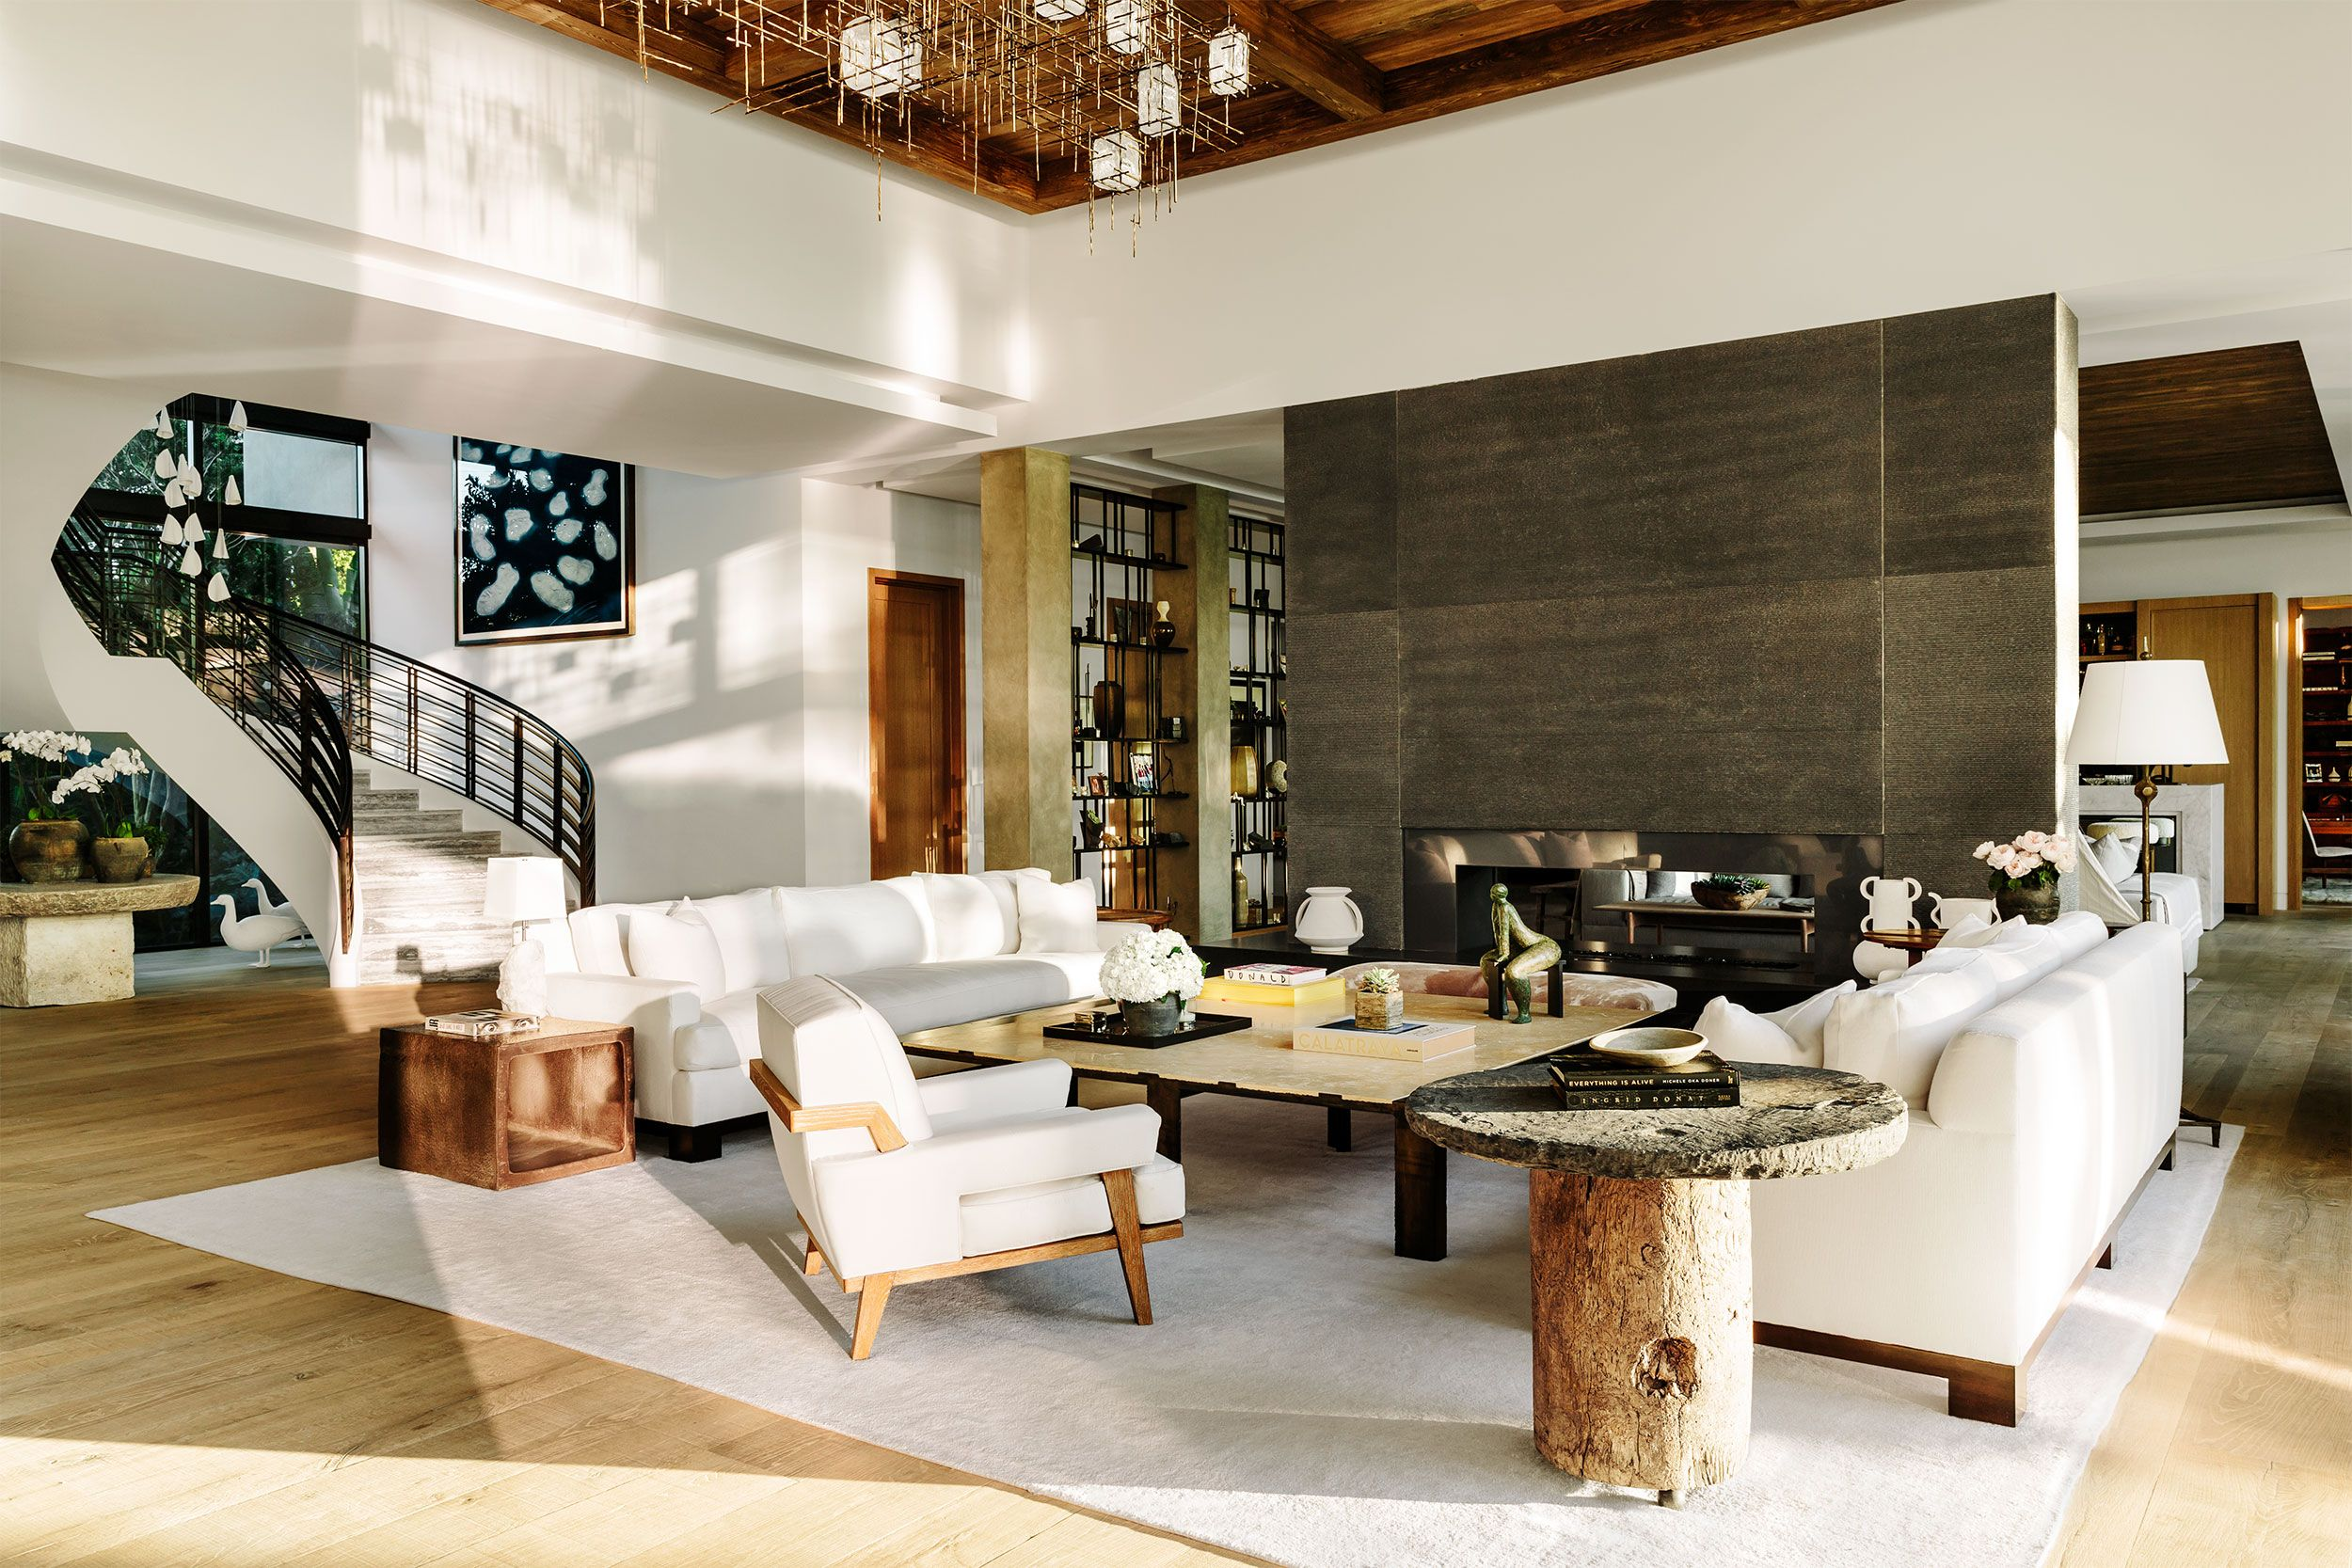 70 Stunning Living Room Ideas Chic, Large Living Room Ideas